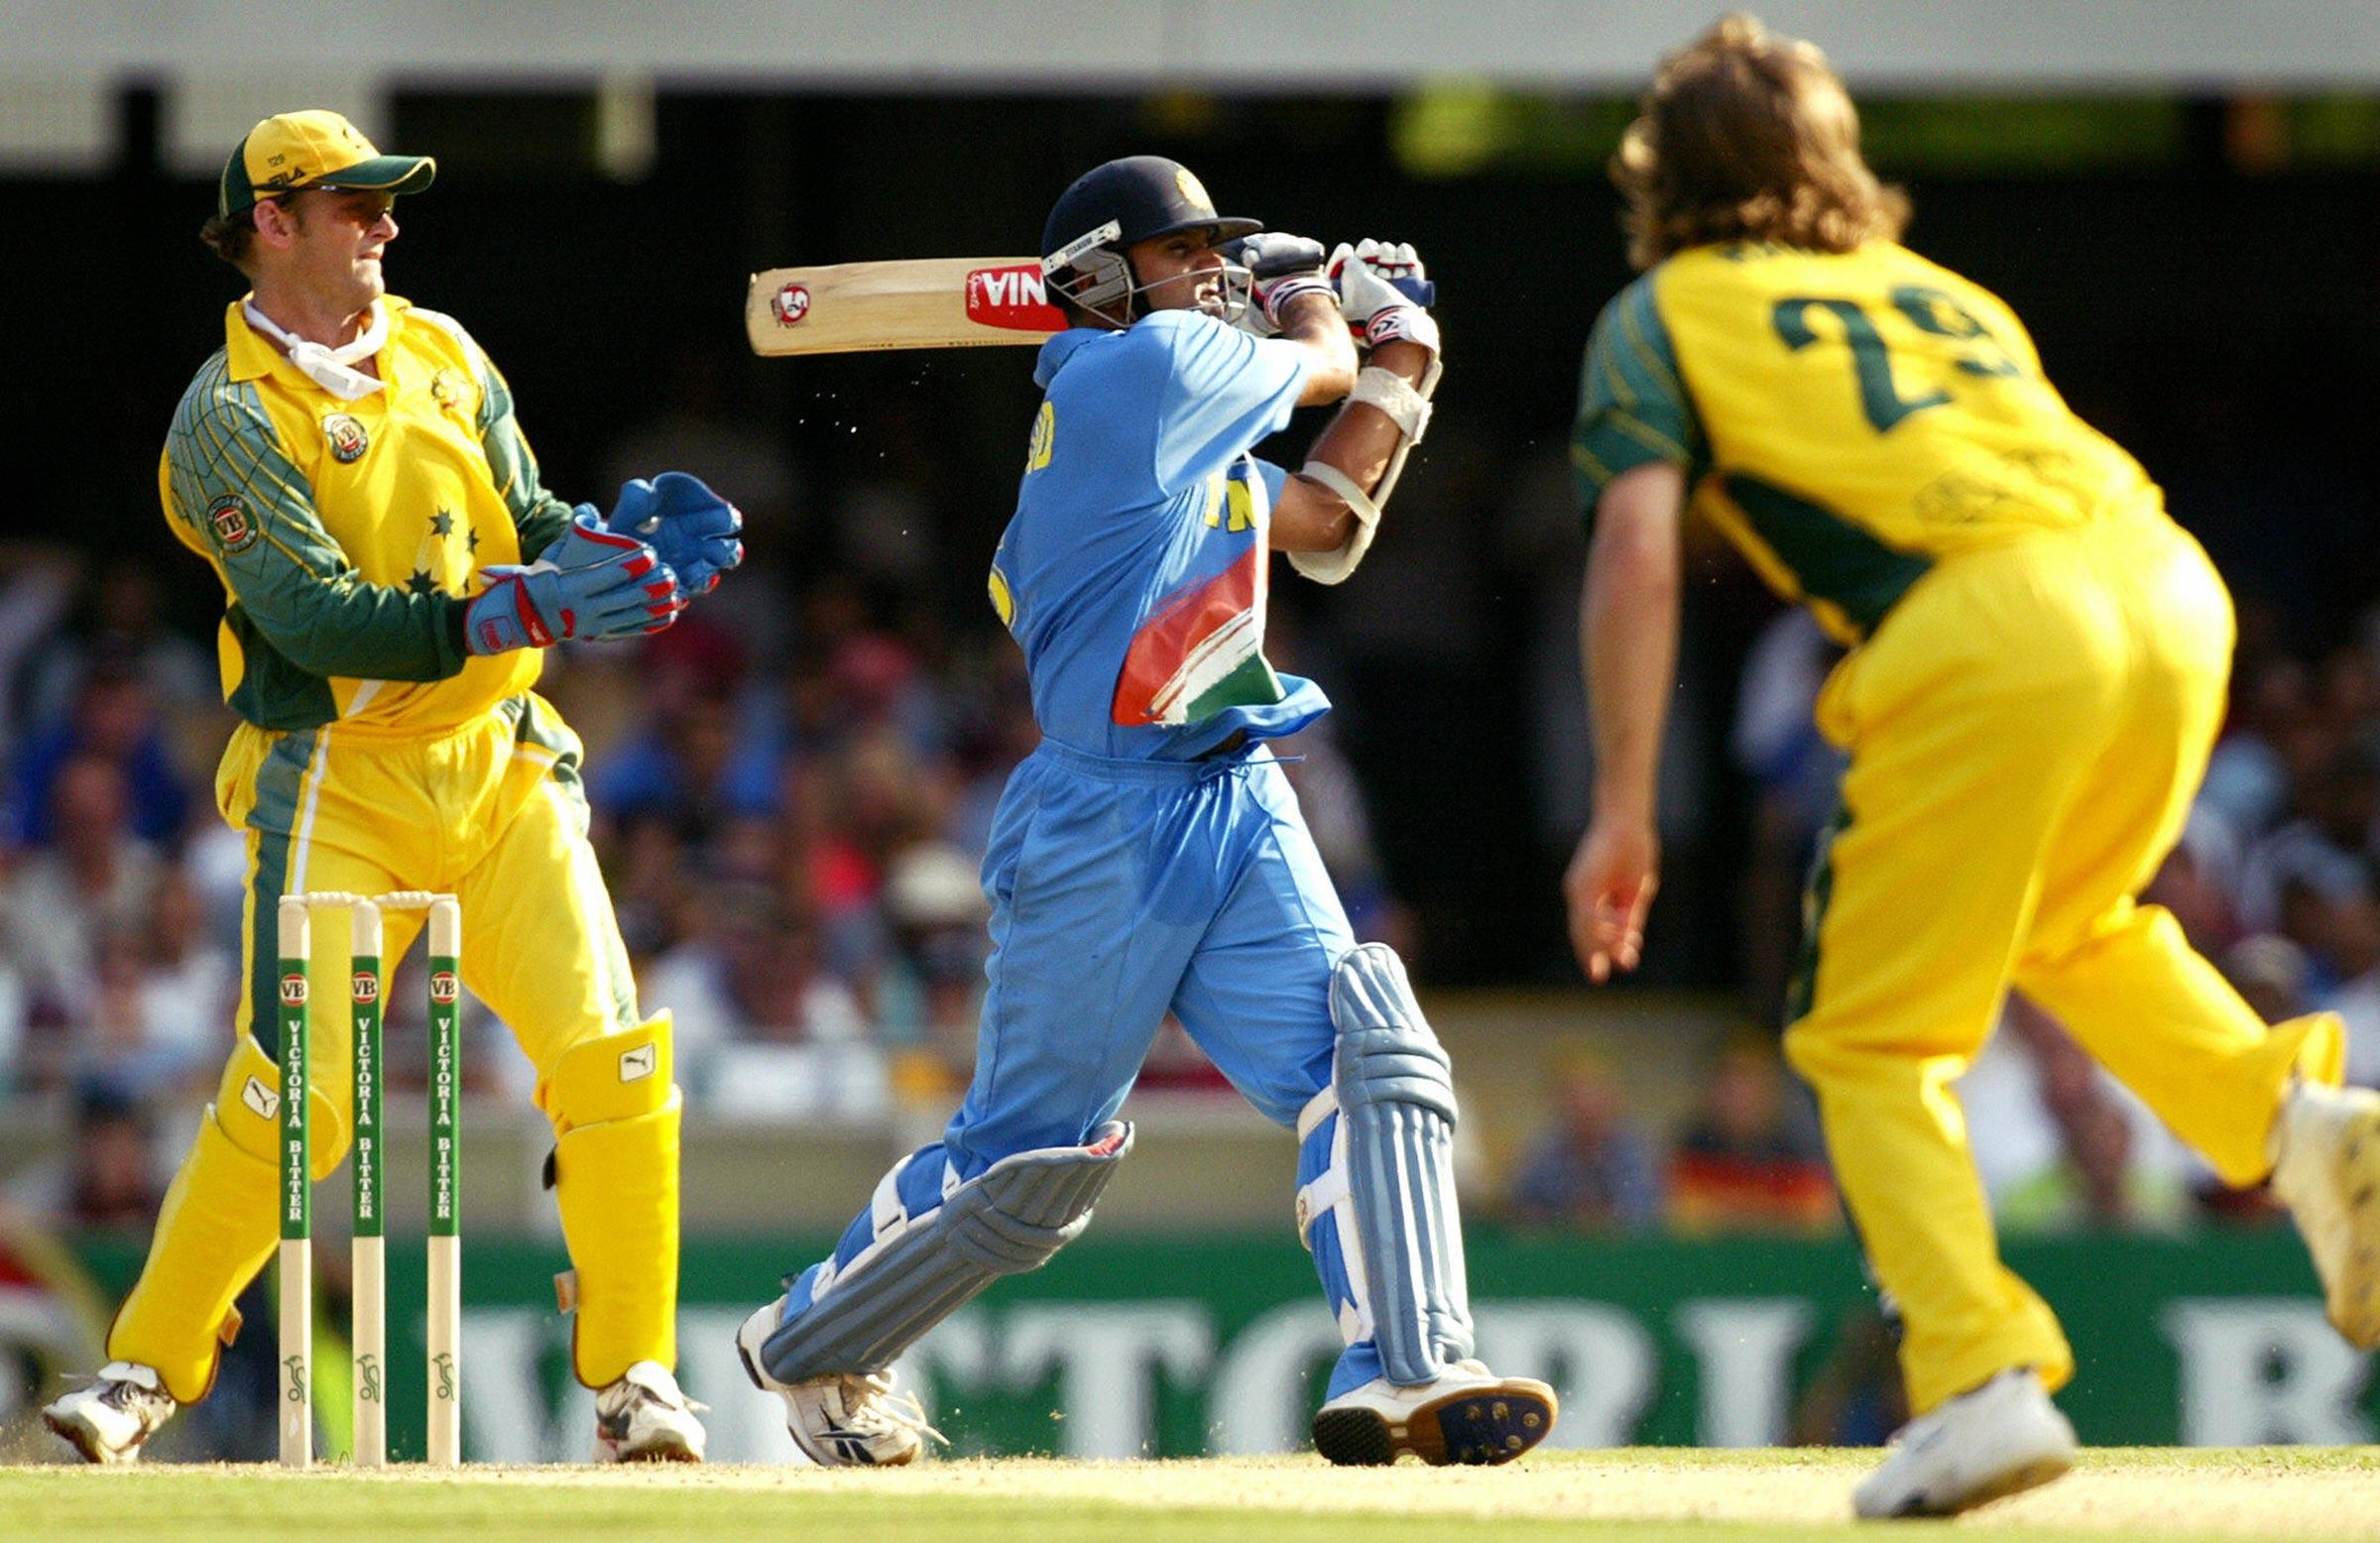 Rahul Dravid plays a pull shot against Ian Harvey // Getty